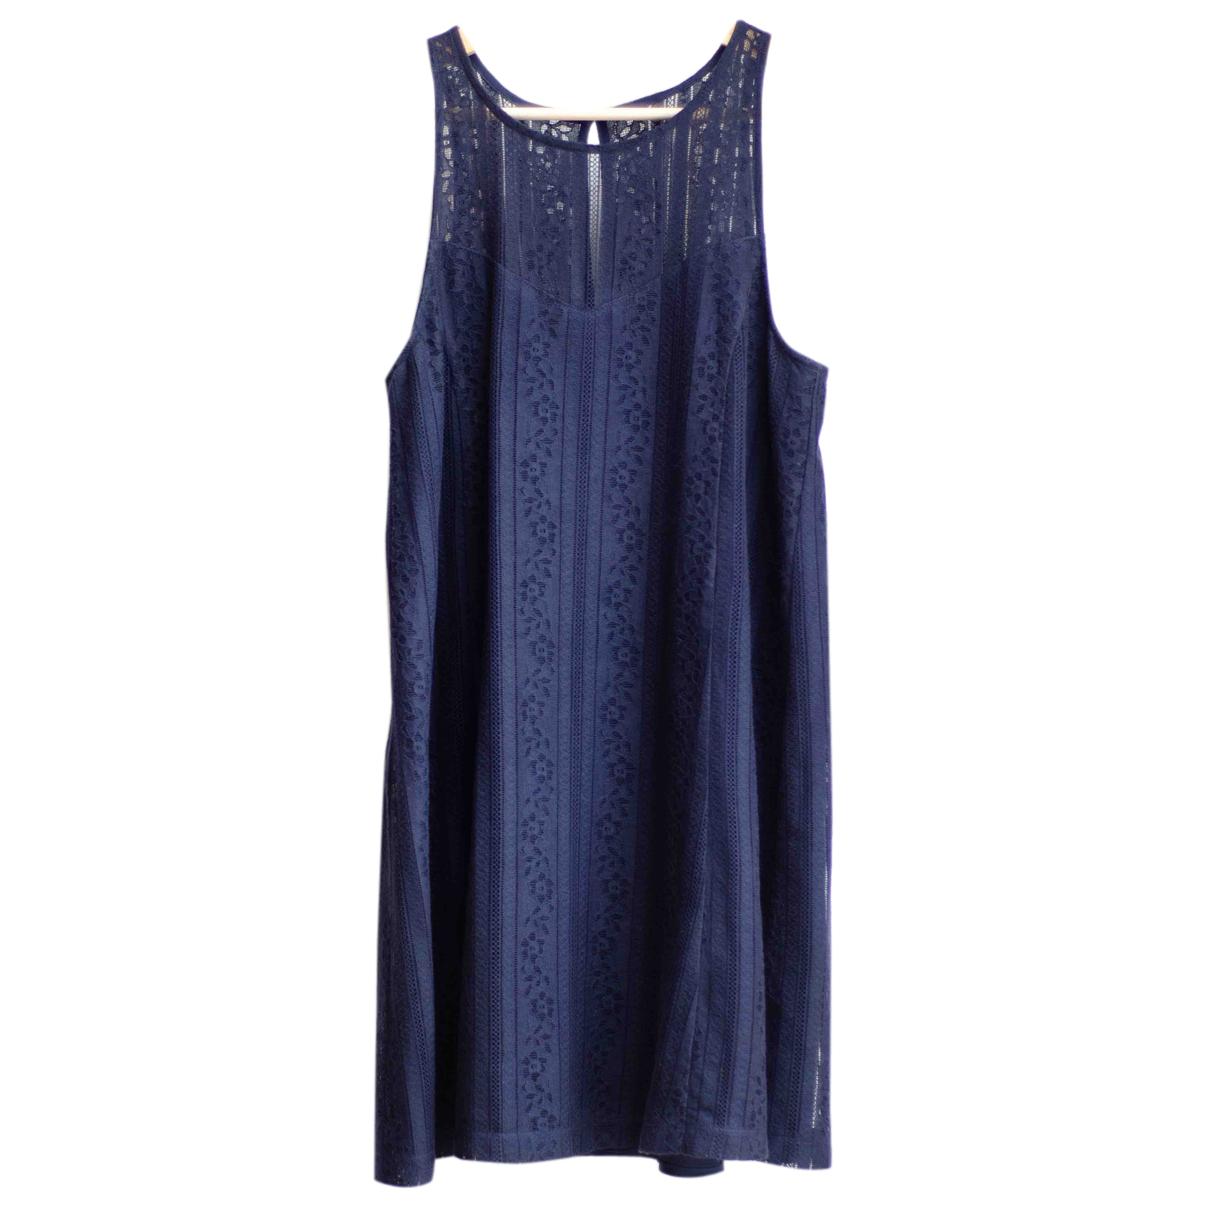 Abercrombie & Fitch \N Kleid in  Blau Baumwolle